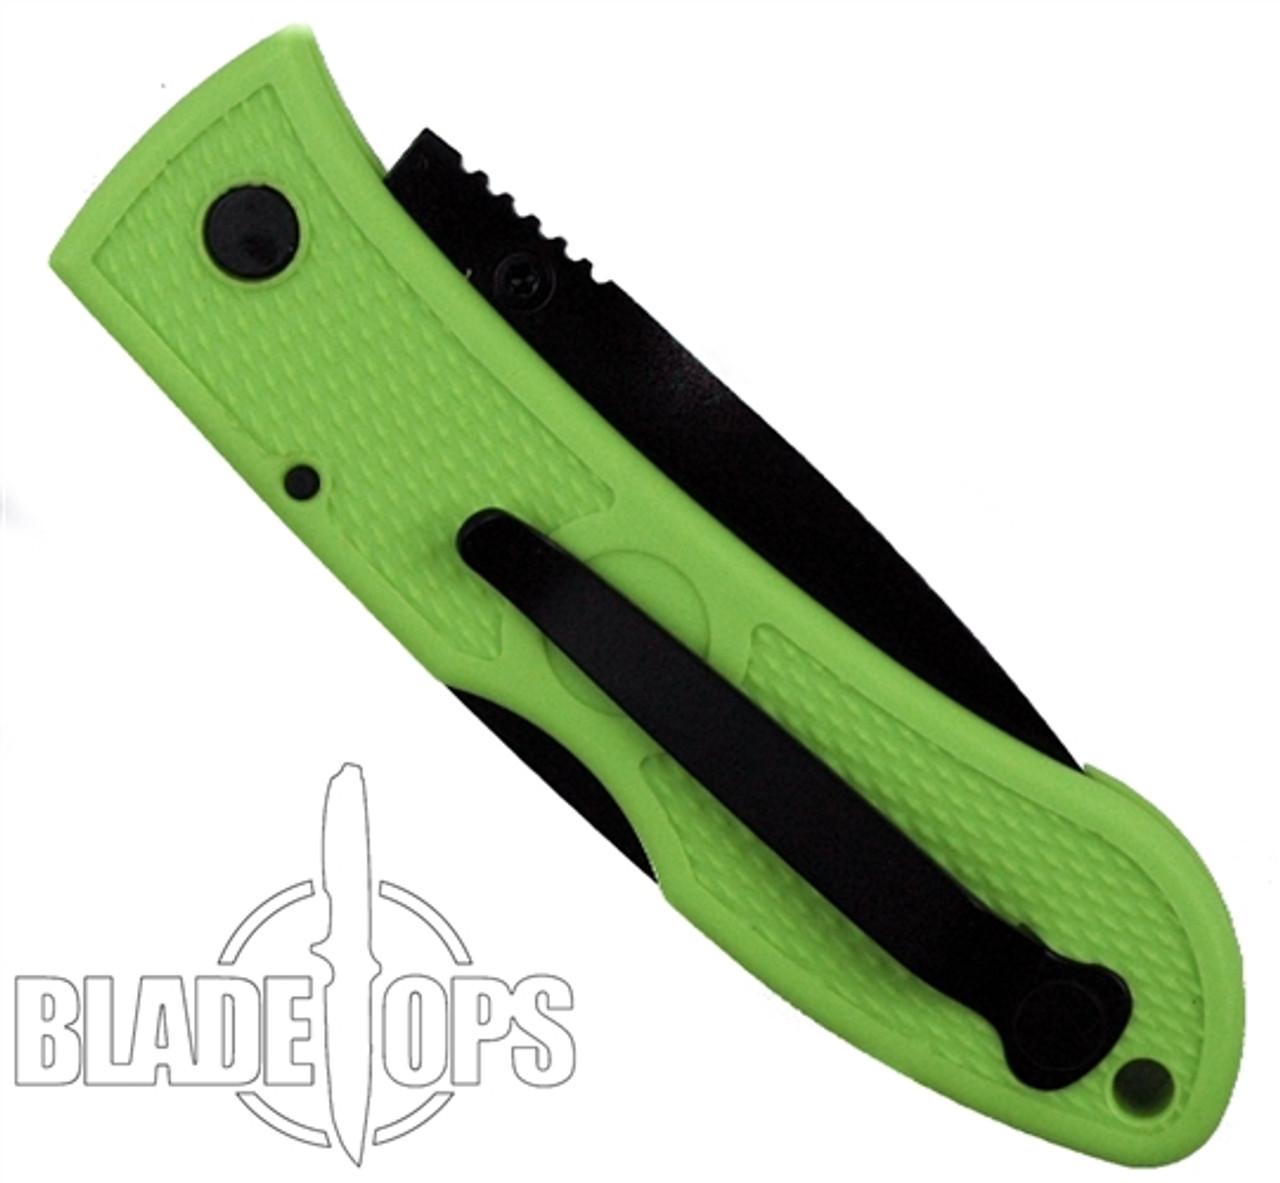 KA-BAR Mini Dozier Zombie Green Folding Hunter Knife, Black Plain Blade